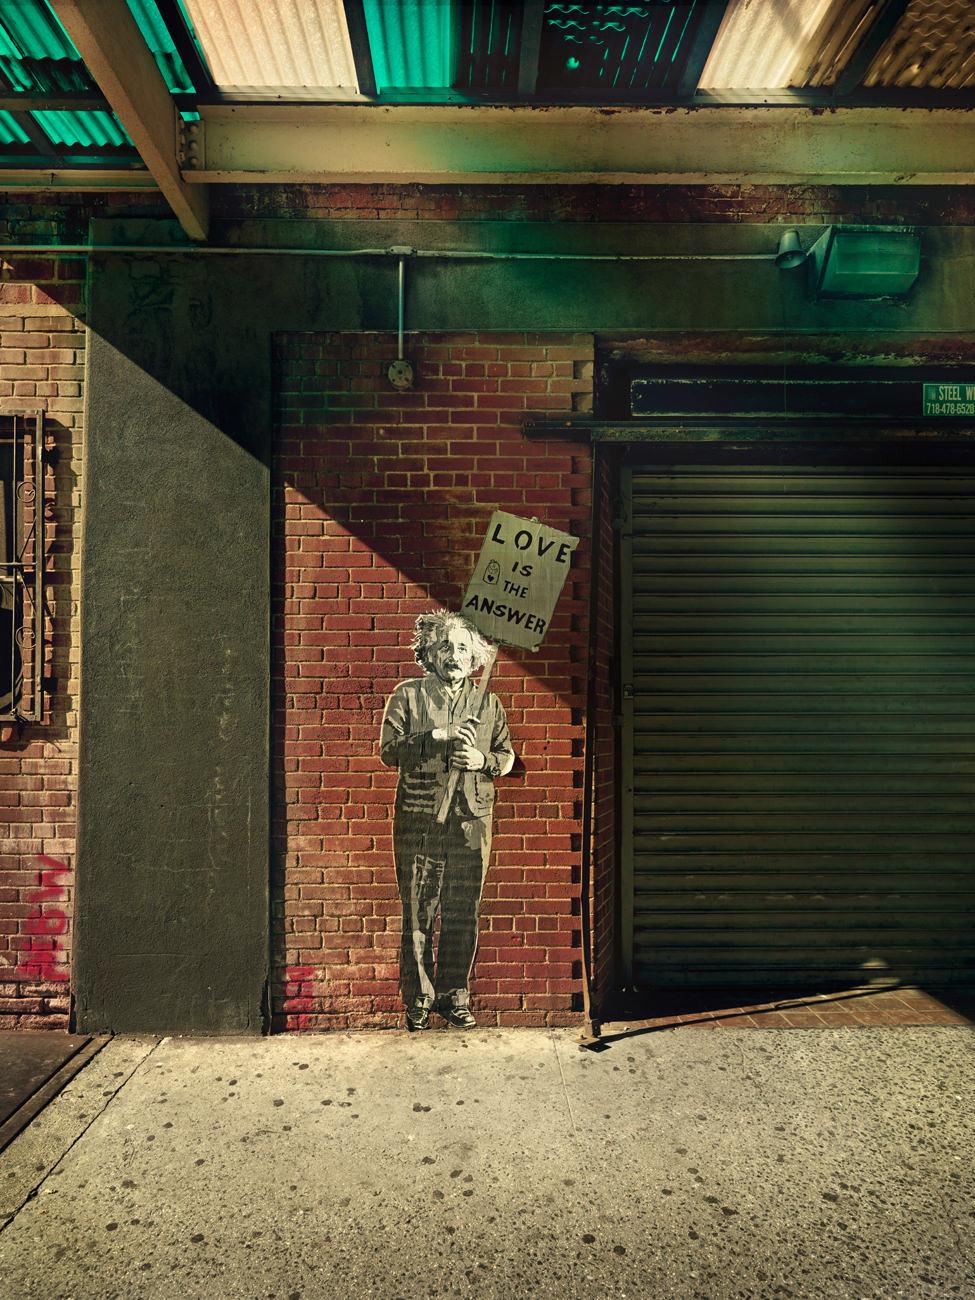 nyc, people, street, new york, portrait, urban, wall, anke luckmann, www.ankeluckmann.com